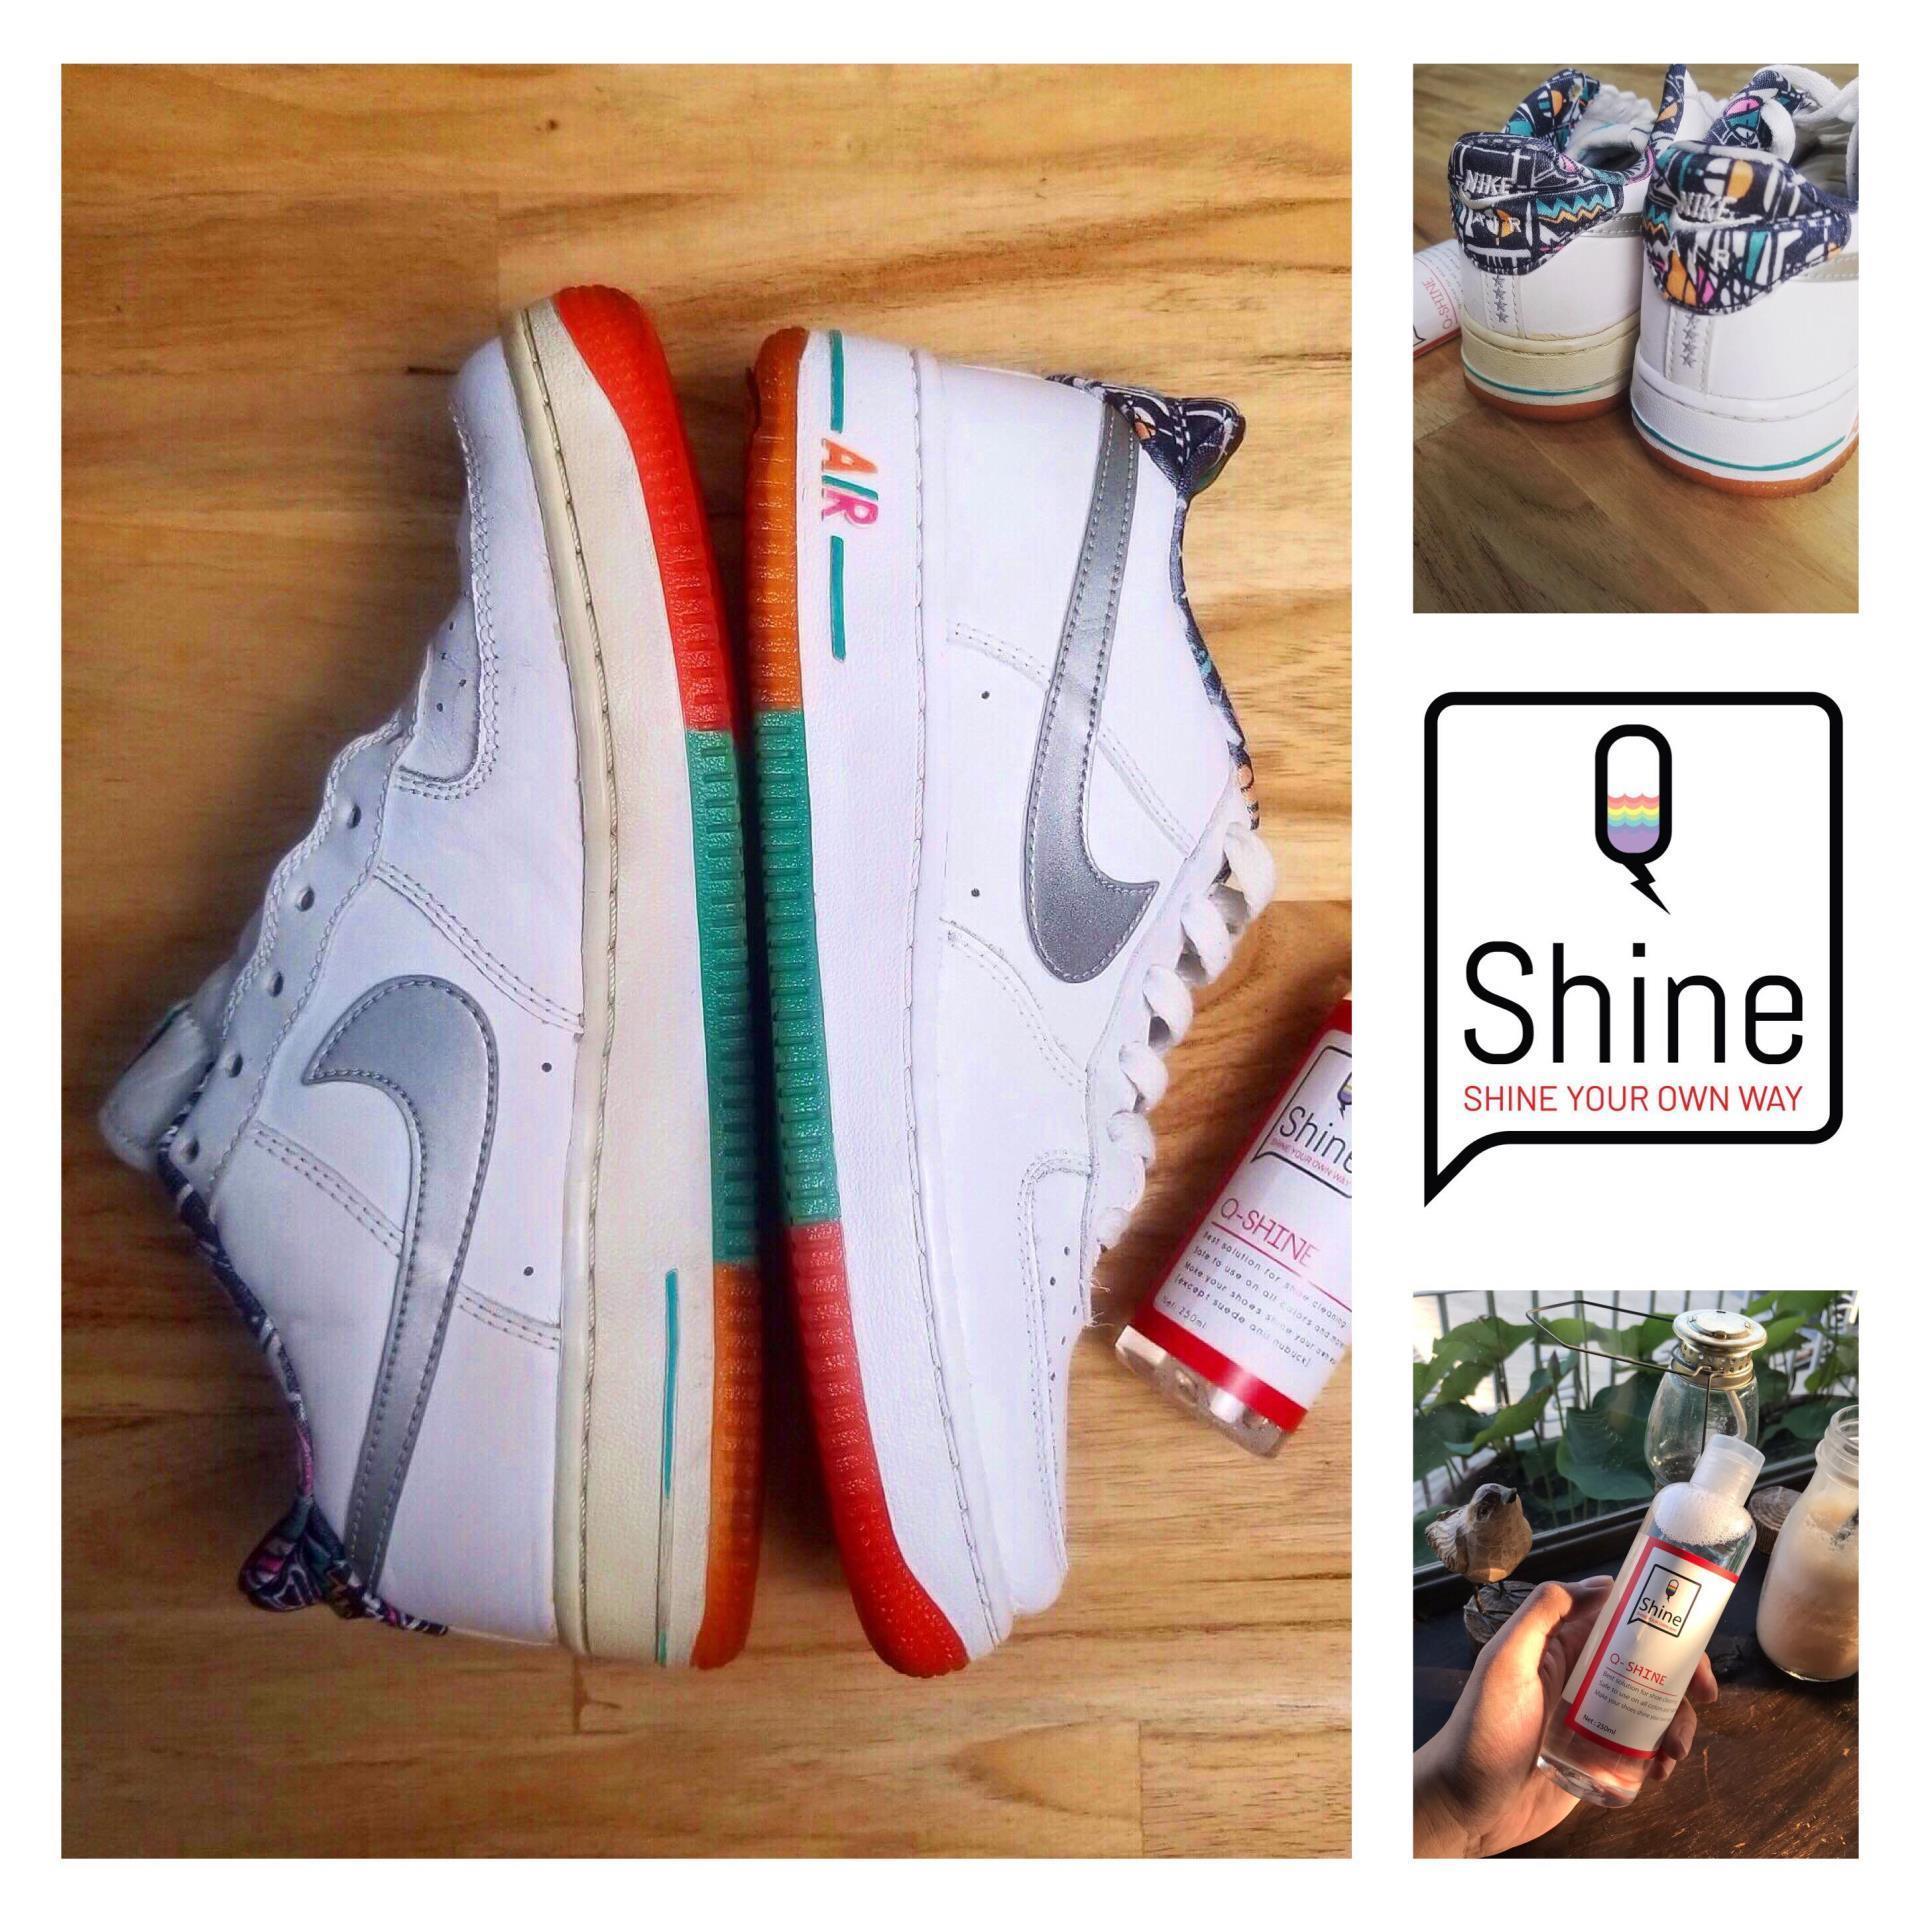 custom-cho-sneaker-la-gi-va-tai-sao-ban-lai-nen-custom-cho-doi-giay-cua-minh